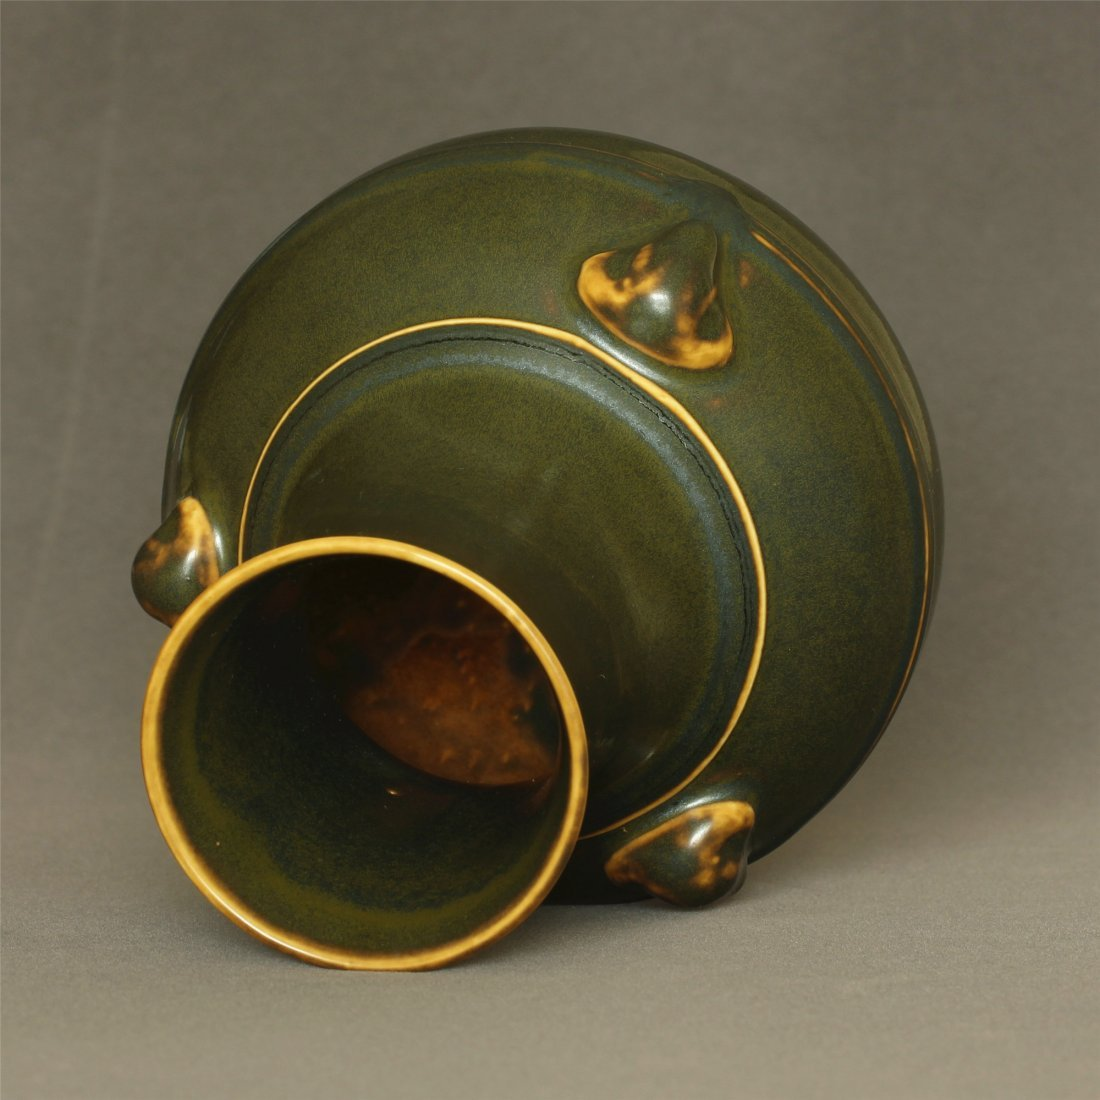 Tea glaze porcelain vase of Qing Dynasty QianLong - 6